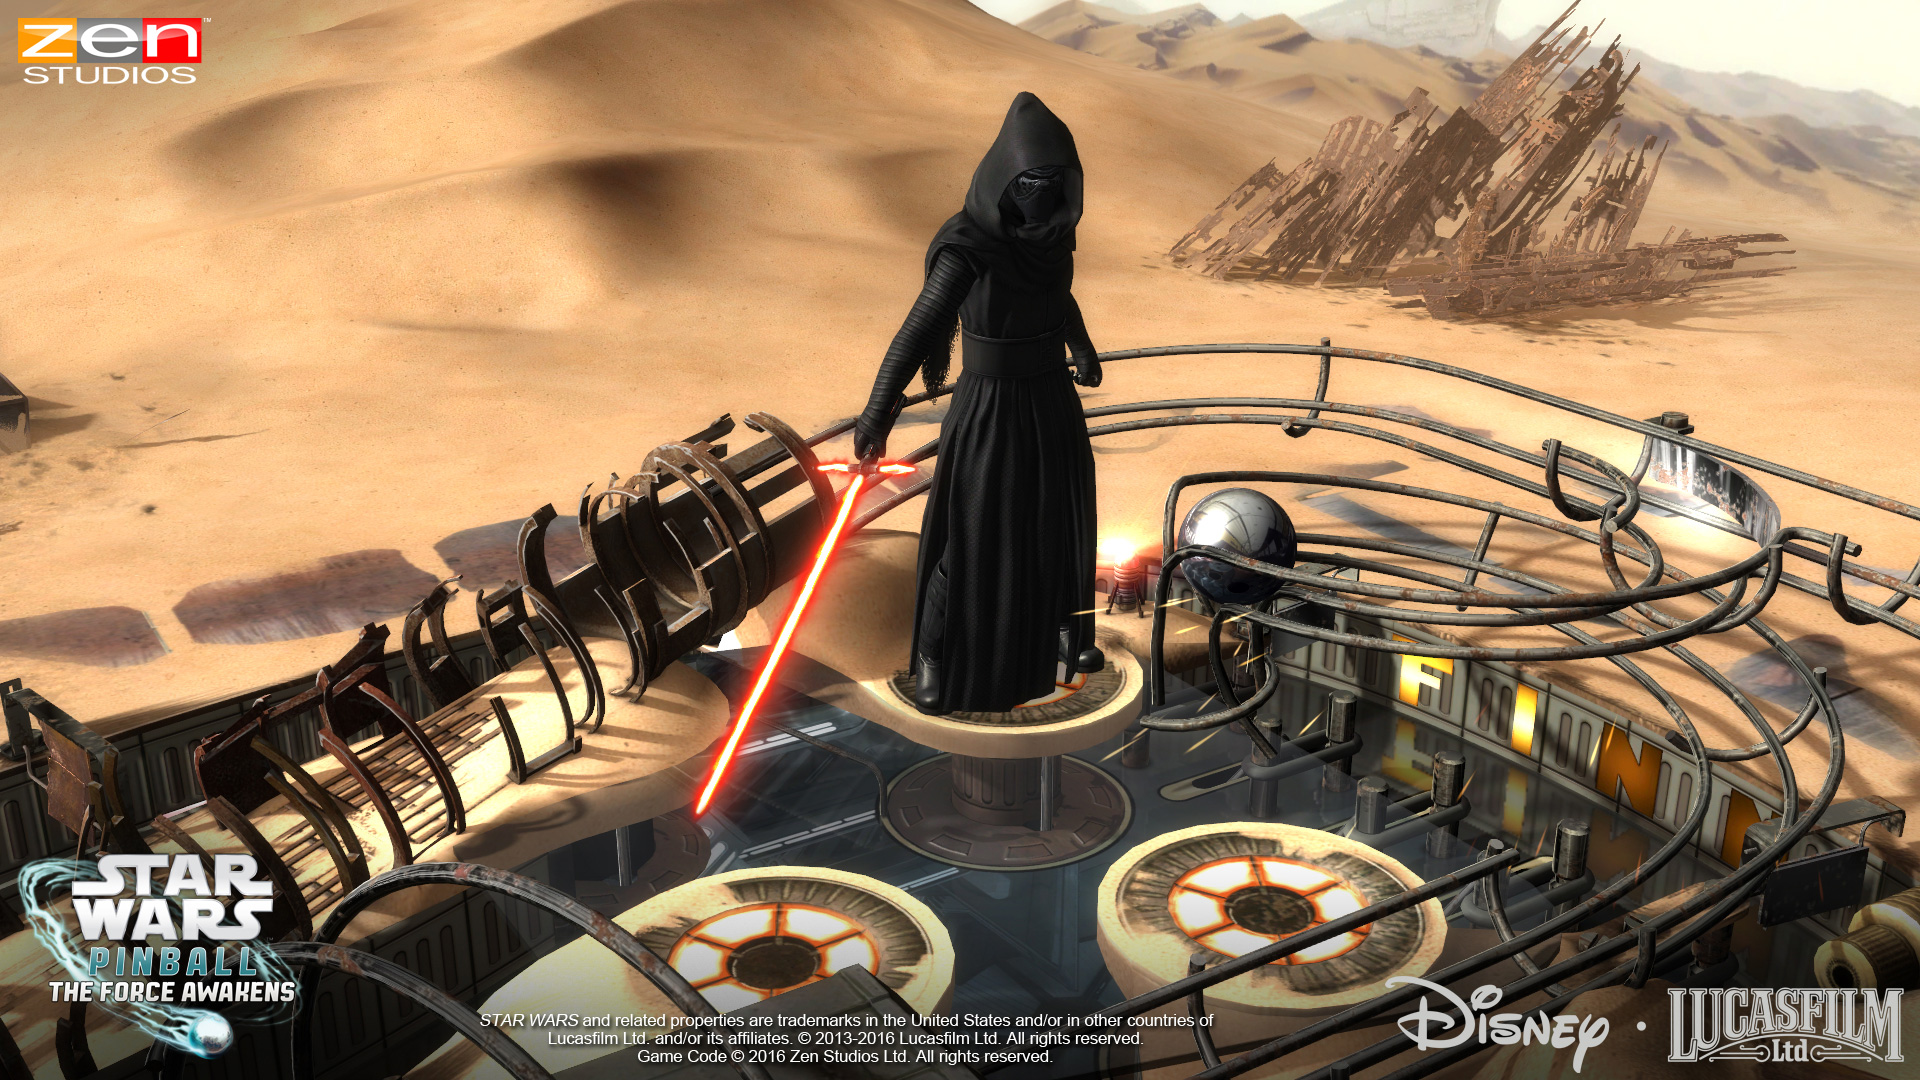 Star Wars Pinball The Force Awakens Screenshot 2